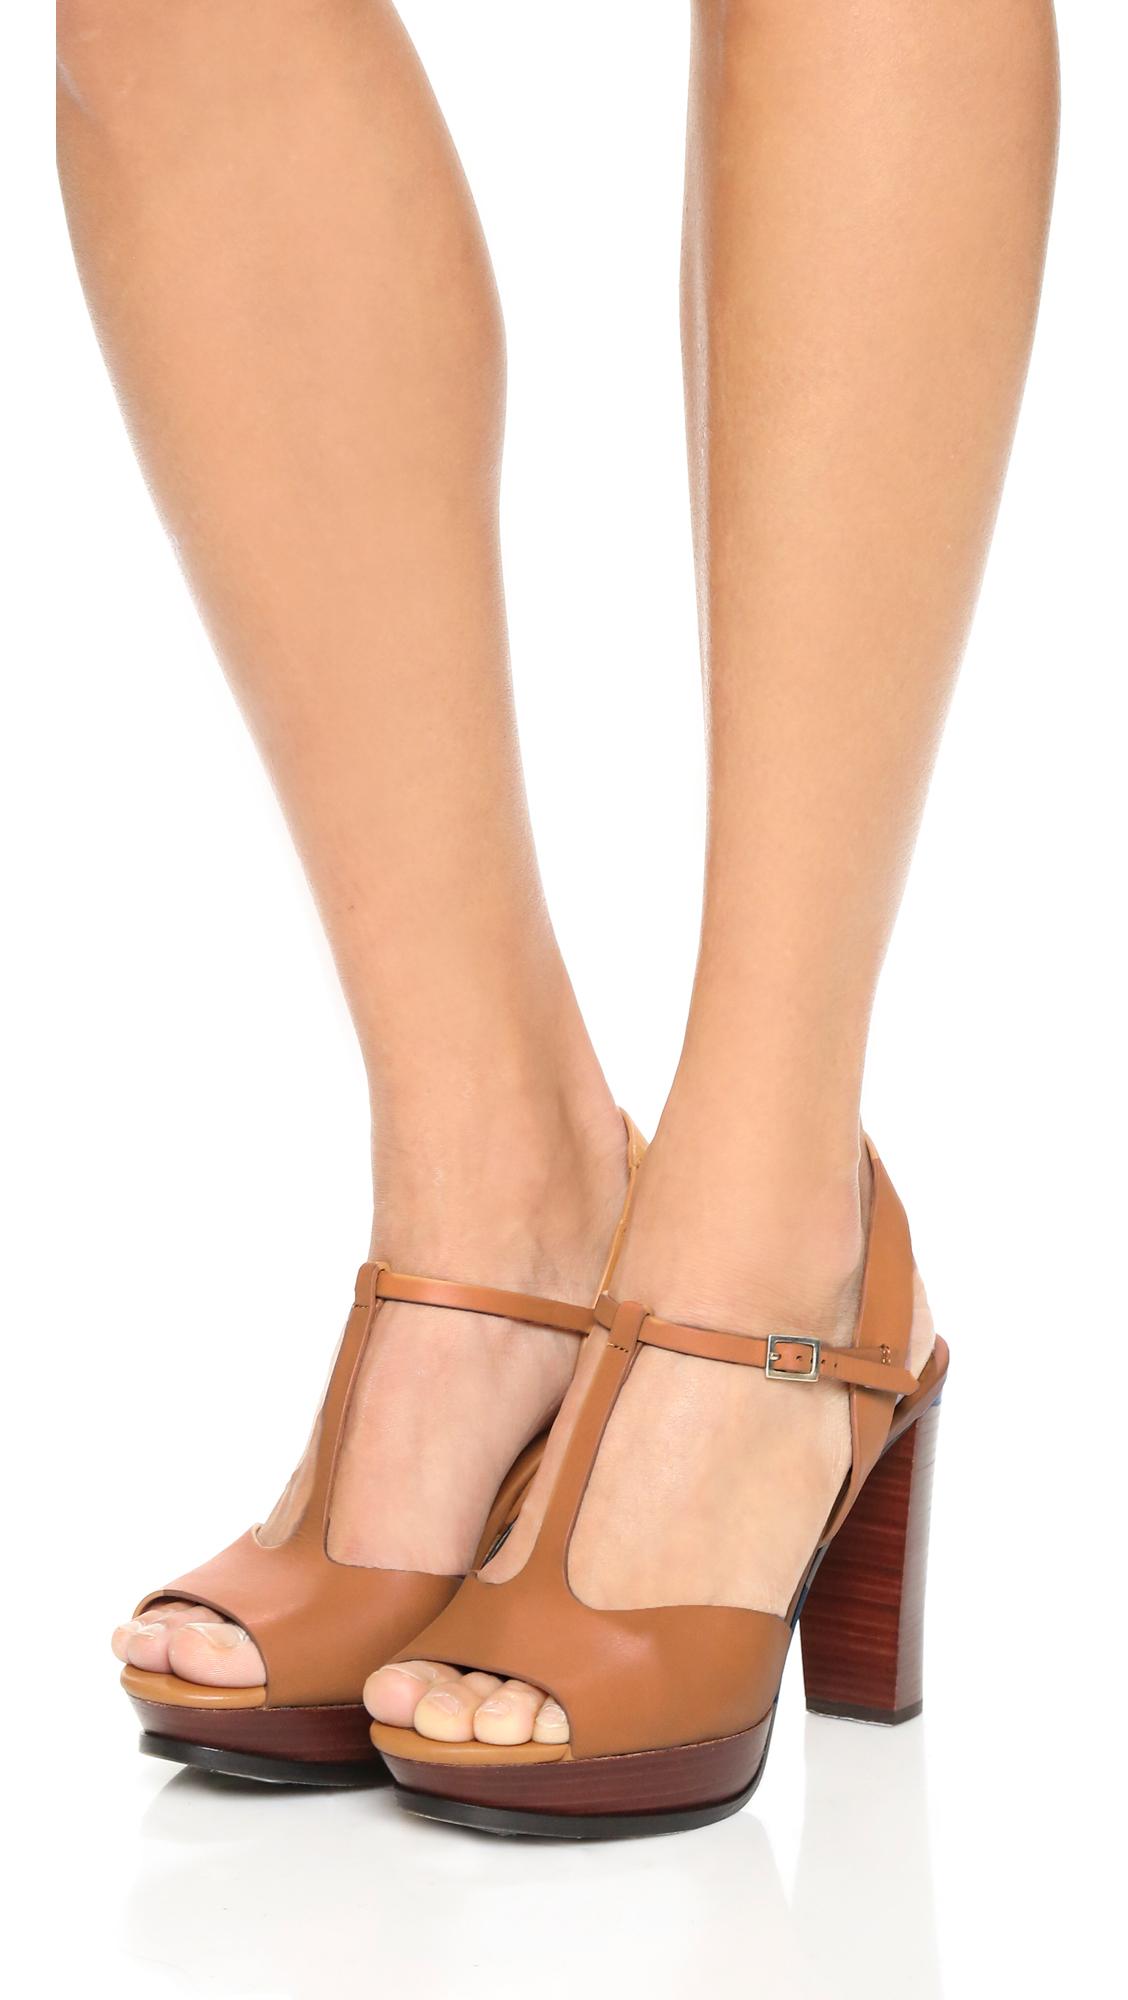 57f8db26bec0 Lyst - See By Chloé Alex Platform Sandals in Brown